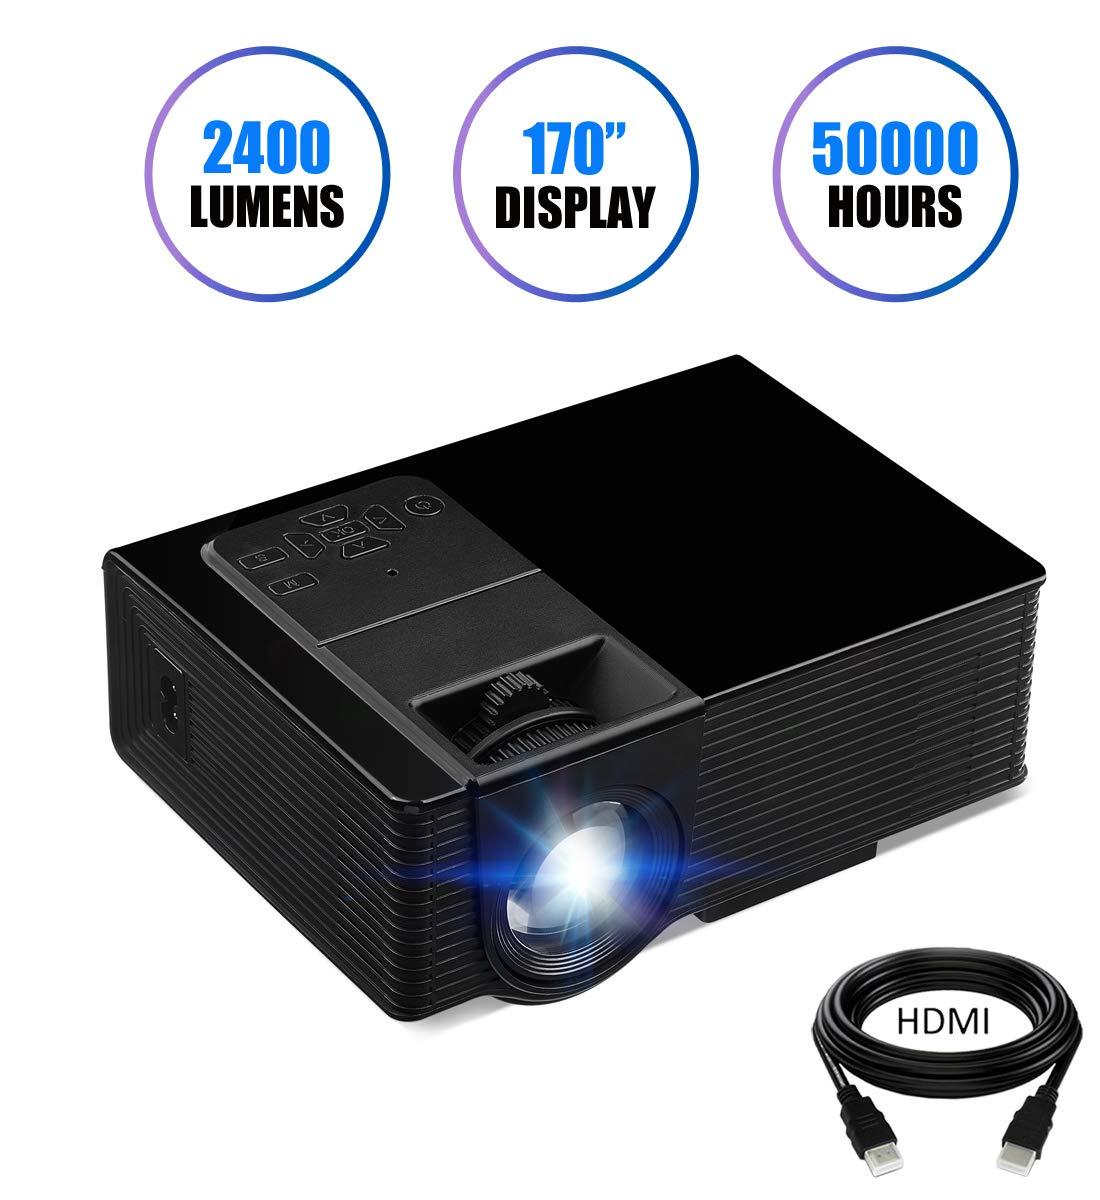 KUAK プロジェクター ミニプロジェクター 2400ルーメン 170インチ ディスプレイ ポータブル HD ホームシアター LED ビデオプロジェクター 1080P HDMI VGA USB AV Mirco SD スマートフォンノートパソコン対応 BK314 B0748DVX46 2019 HT50